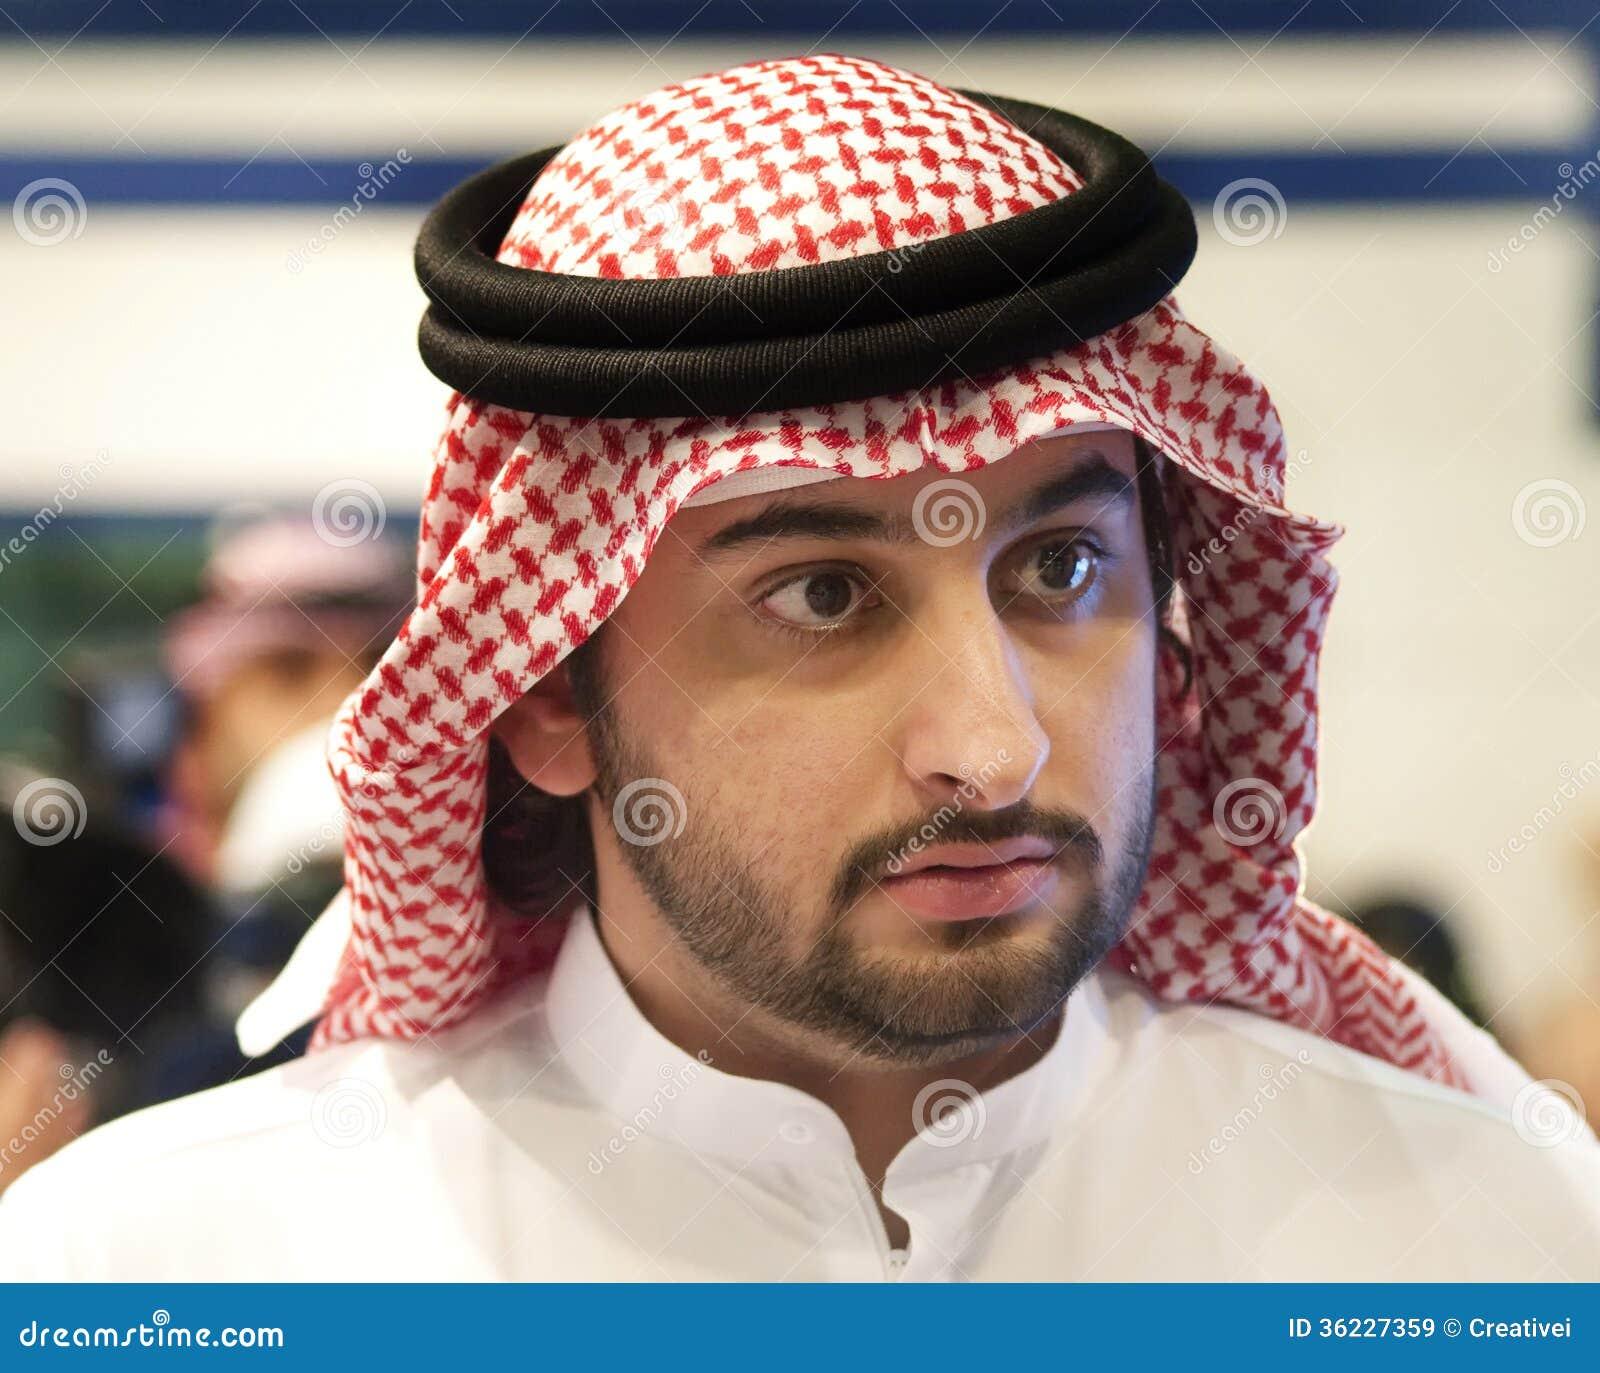 Sheikh Maktoum Bin Mohammed Bin Rashid Al Maktoum Royalty Free Stock Images - sheikh-maktoum-bin-mohammed-bin-rashid-al-maktoum-dubai-uae-april-deputy-ruler-dubai-islamic-peace-conference-april-36227359